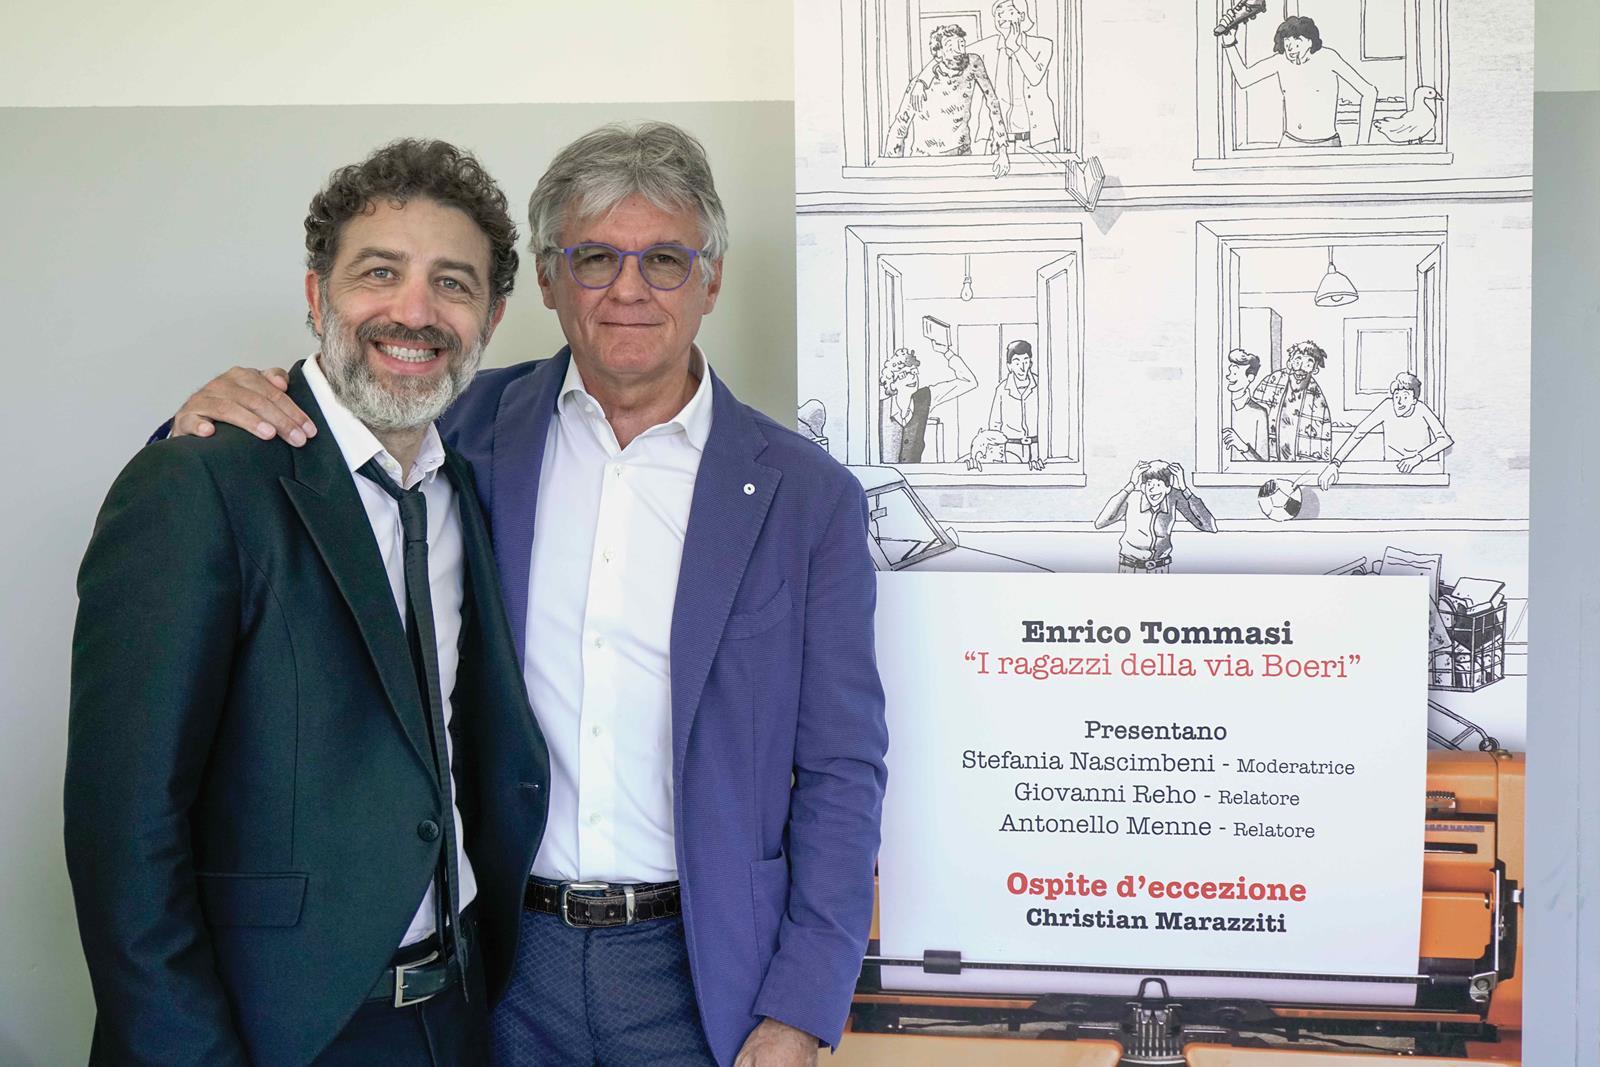 Enrico Tommasi: